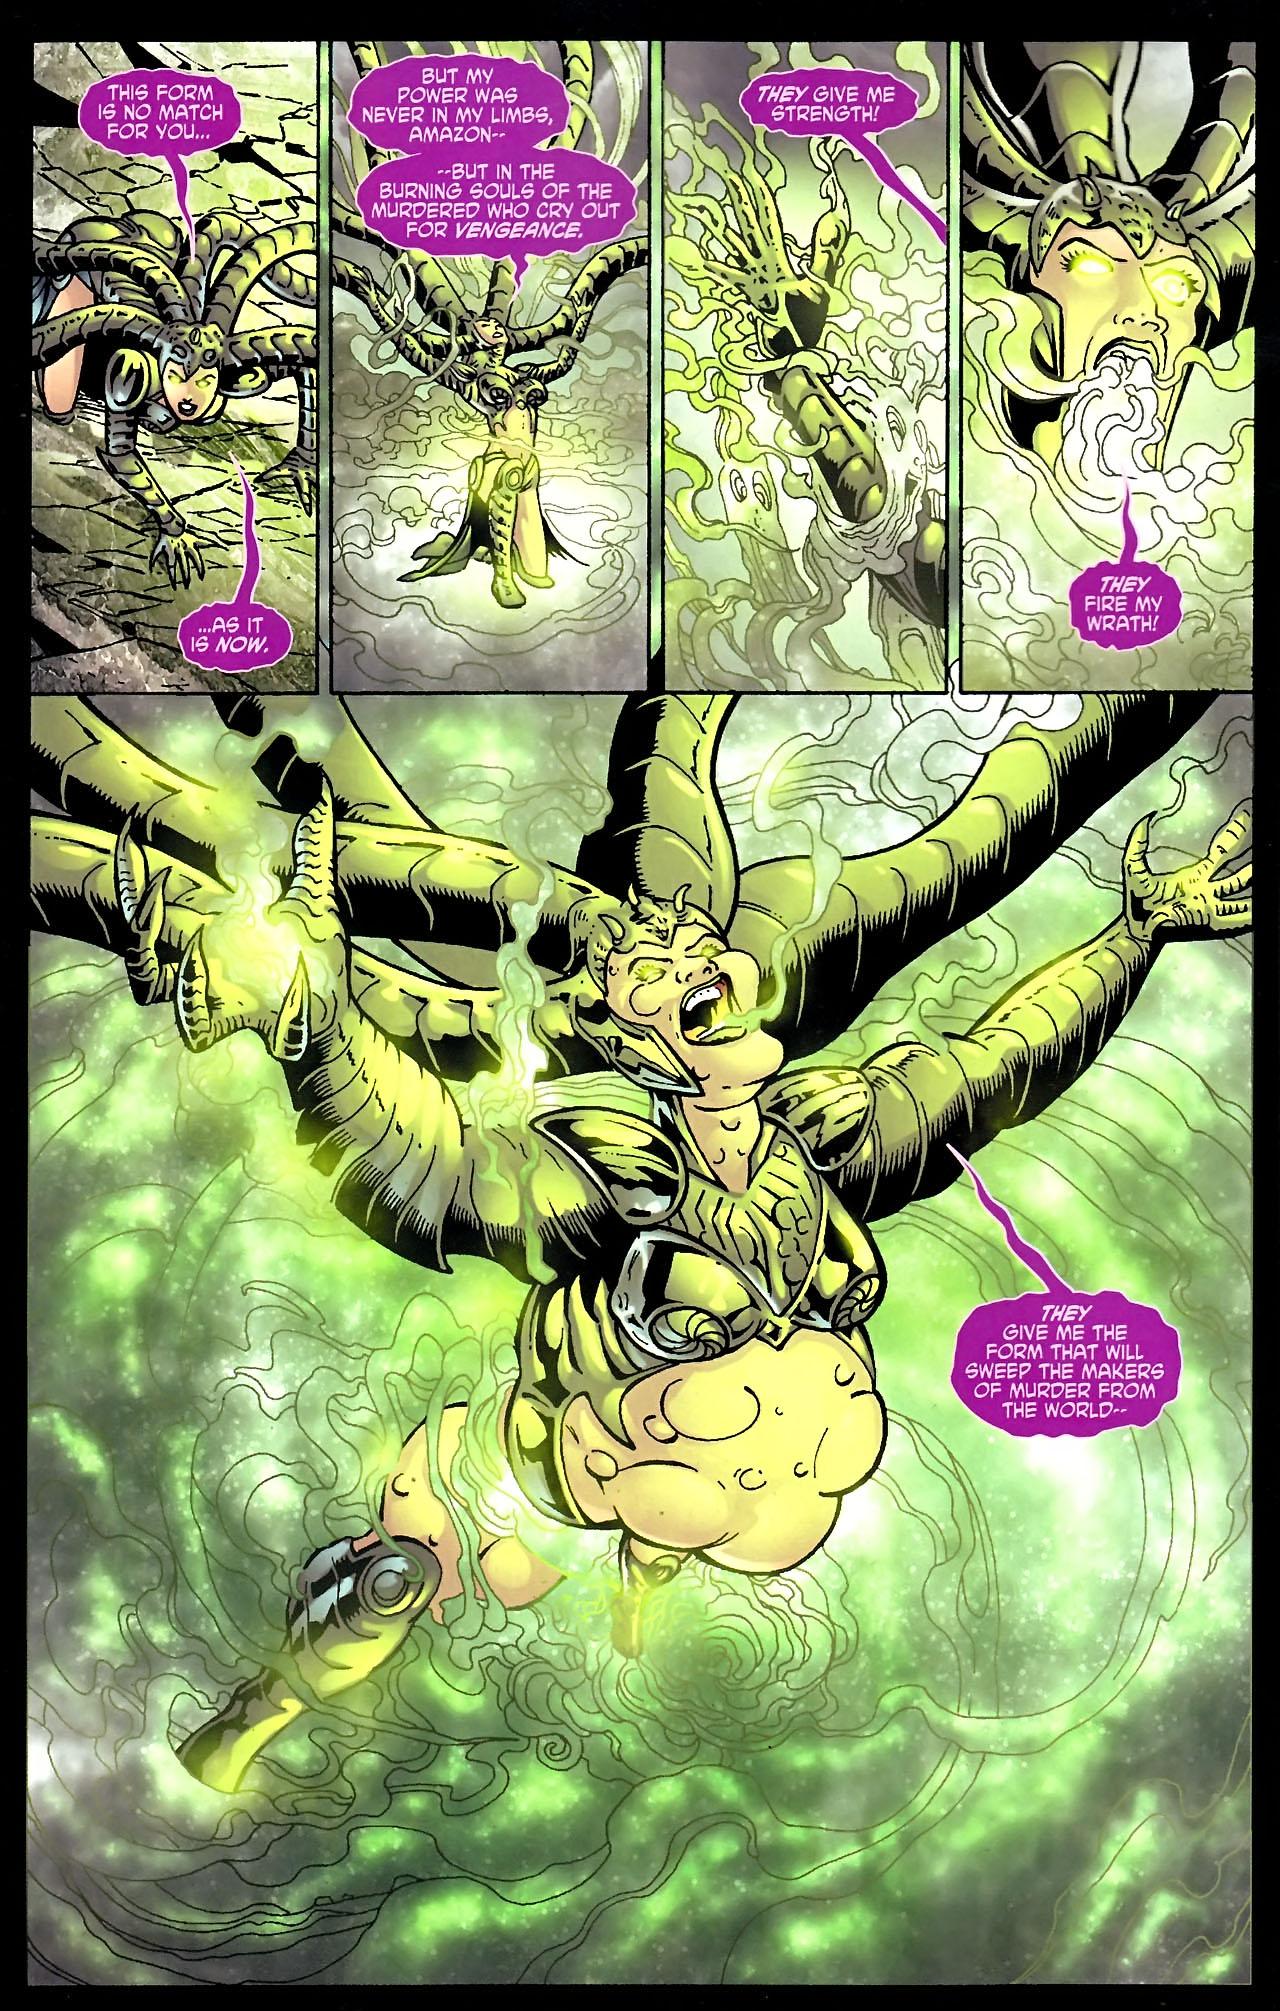 Read online Wonder Woman (2006) comic -  Issue #614 - 5